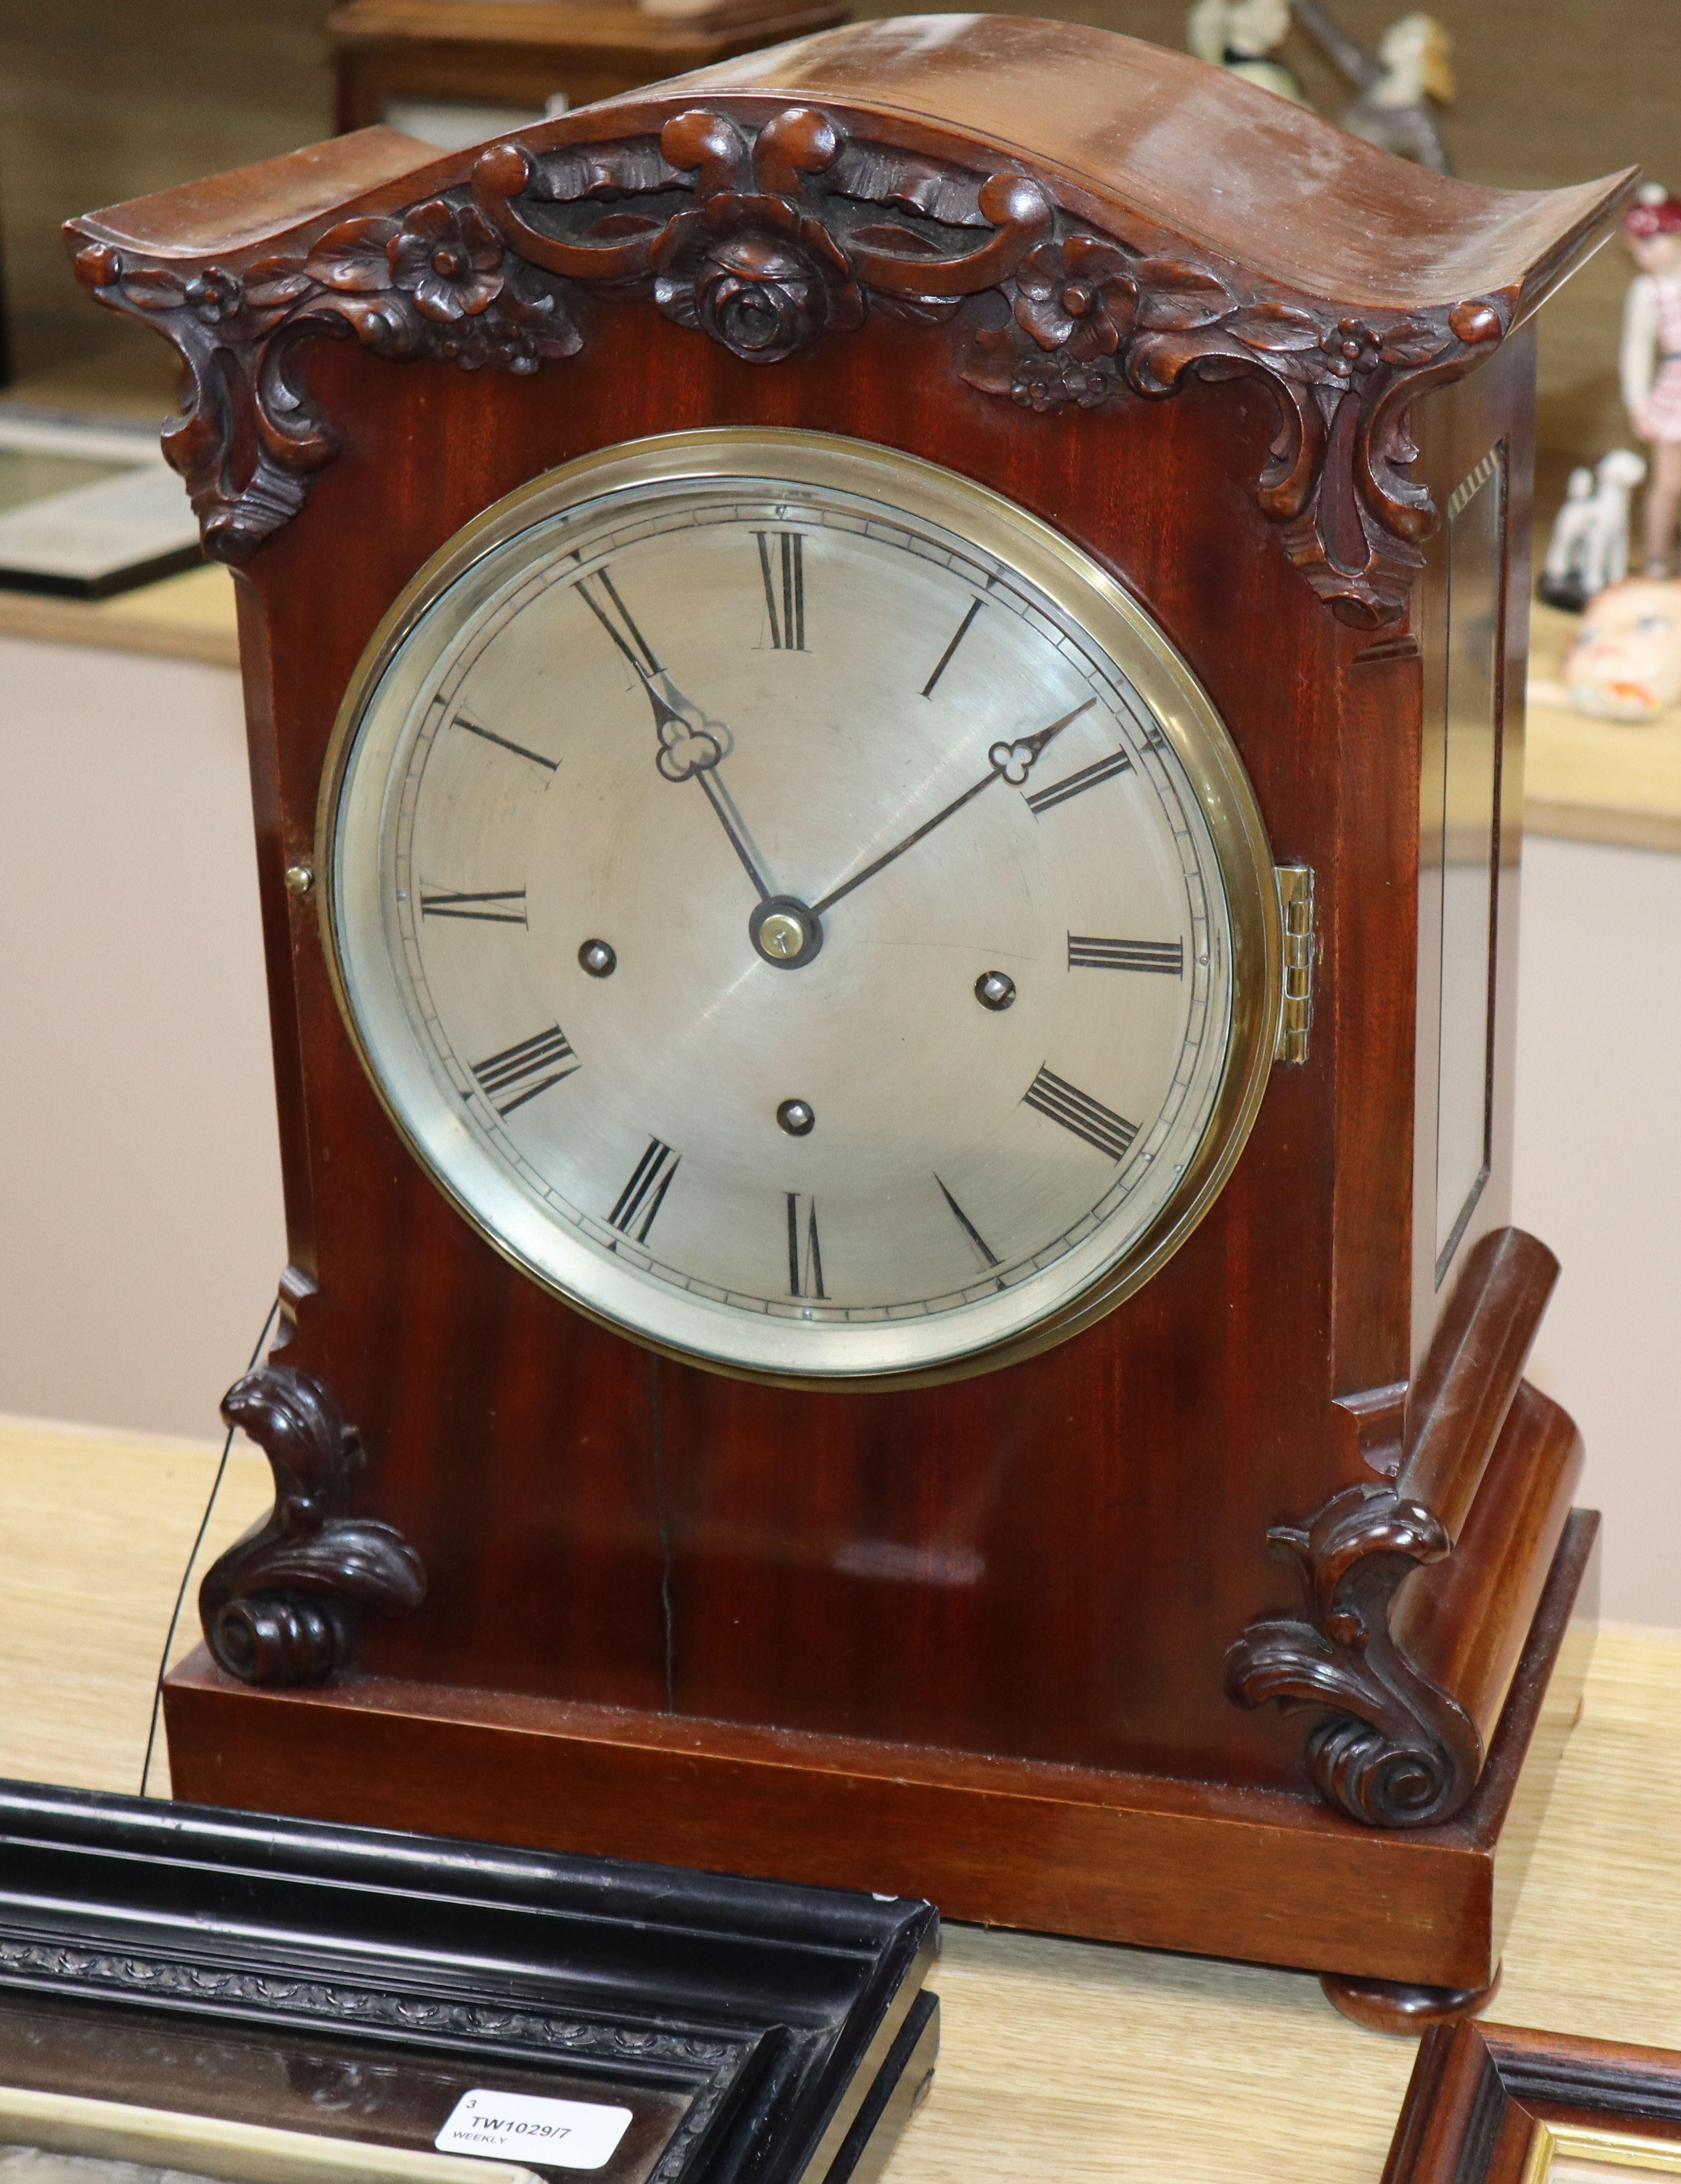 Lot 52 - A Victorian mahogany repeating bracket clock having silvered Roman dial, striking and chiming on